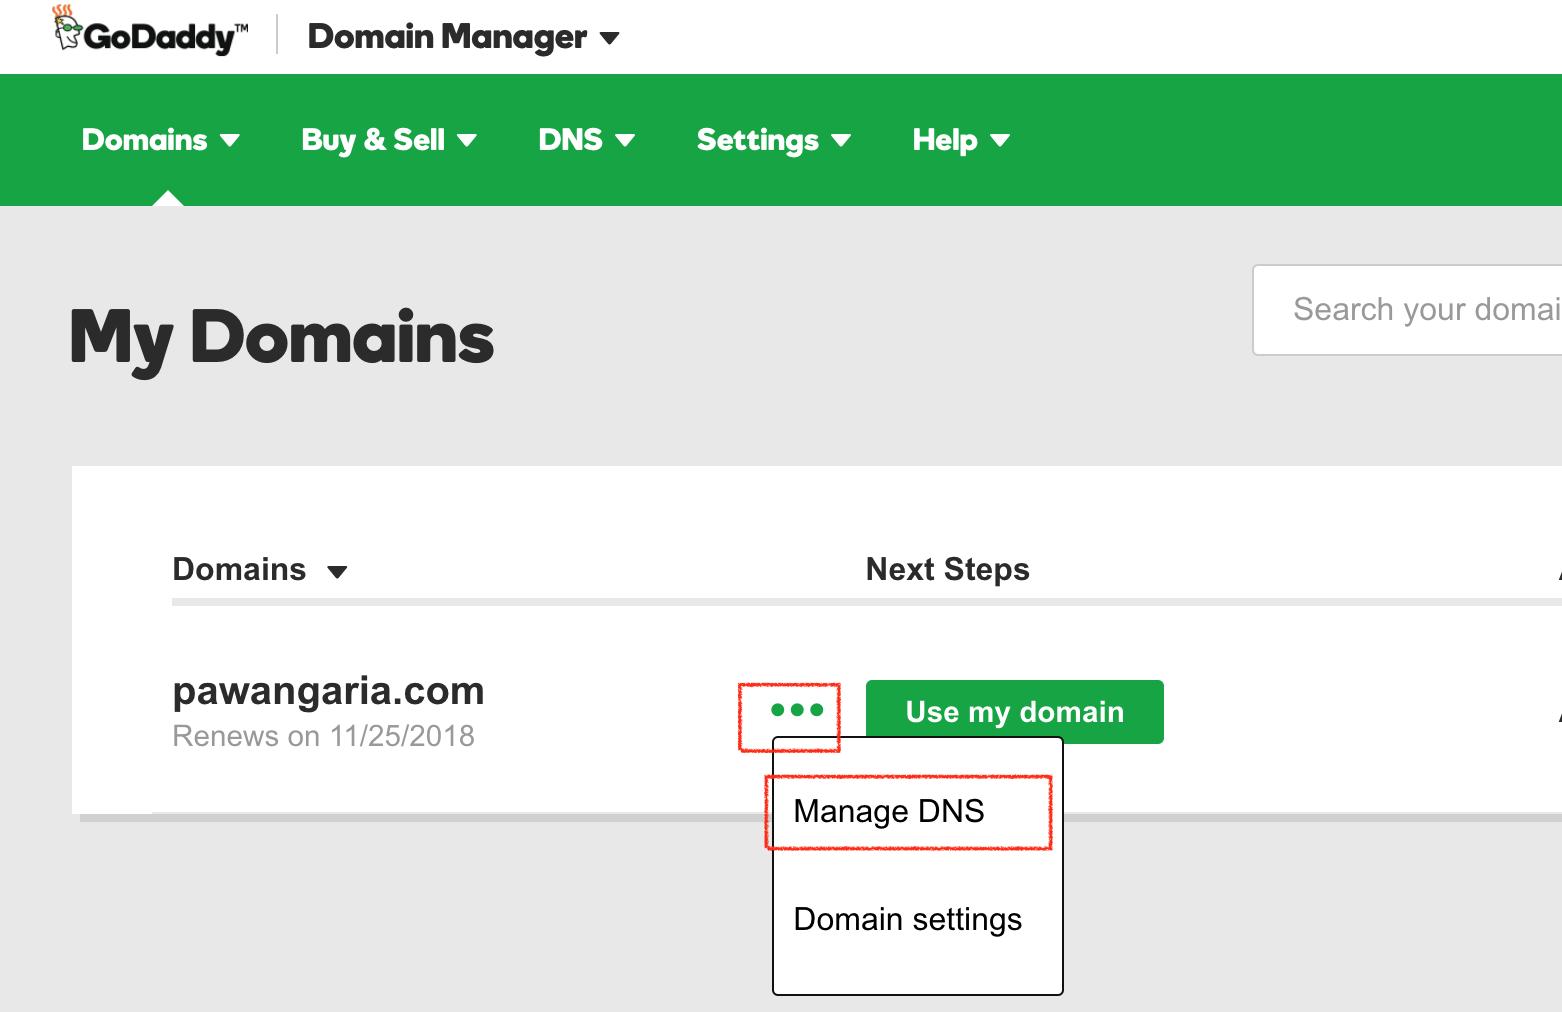 godaddy-manage-domain-dns